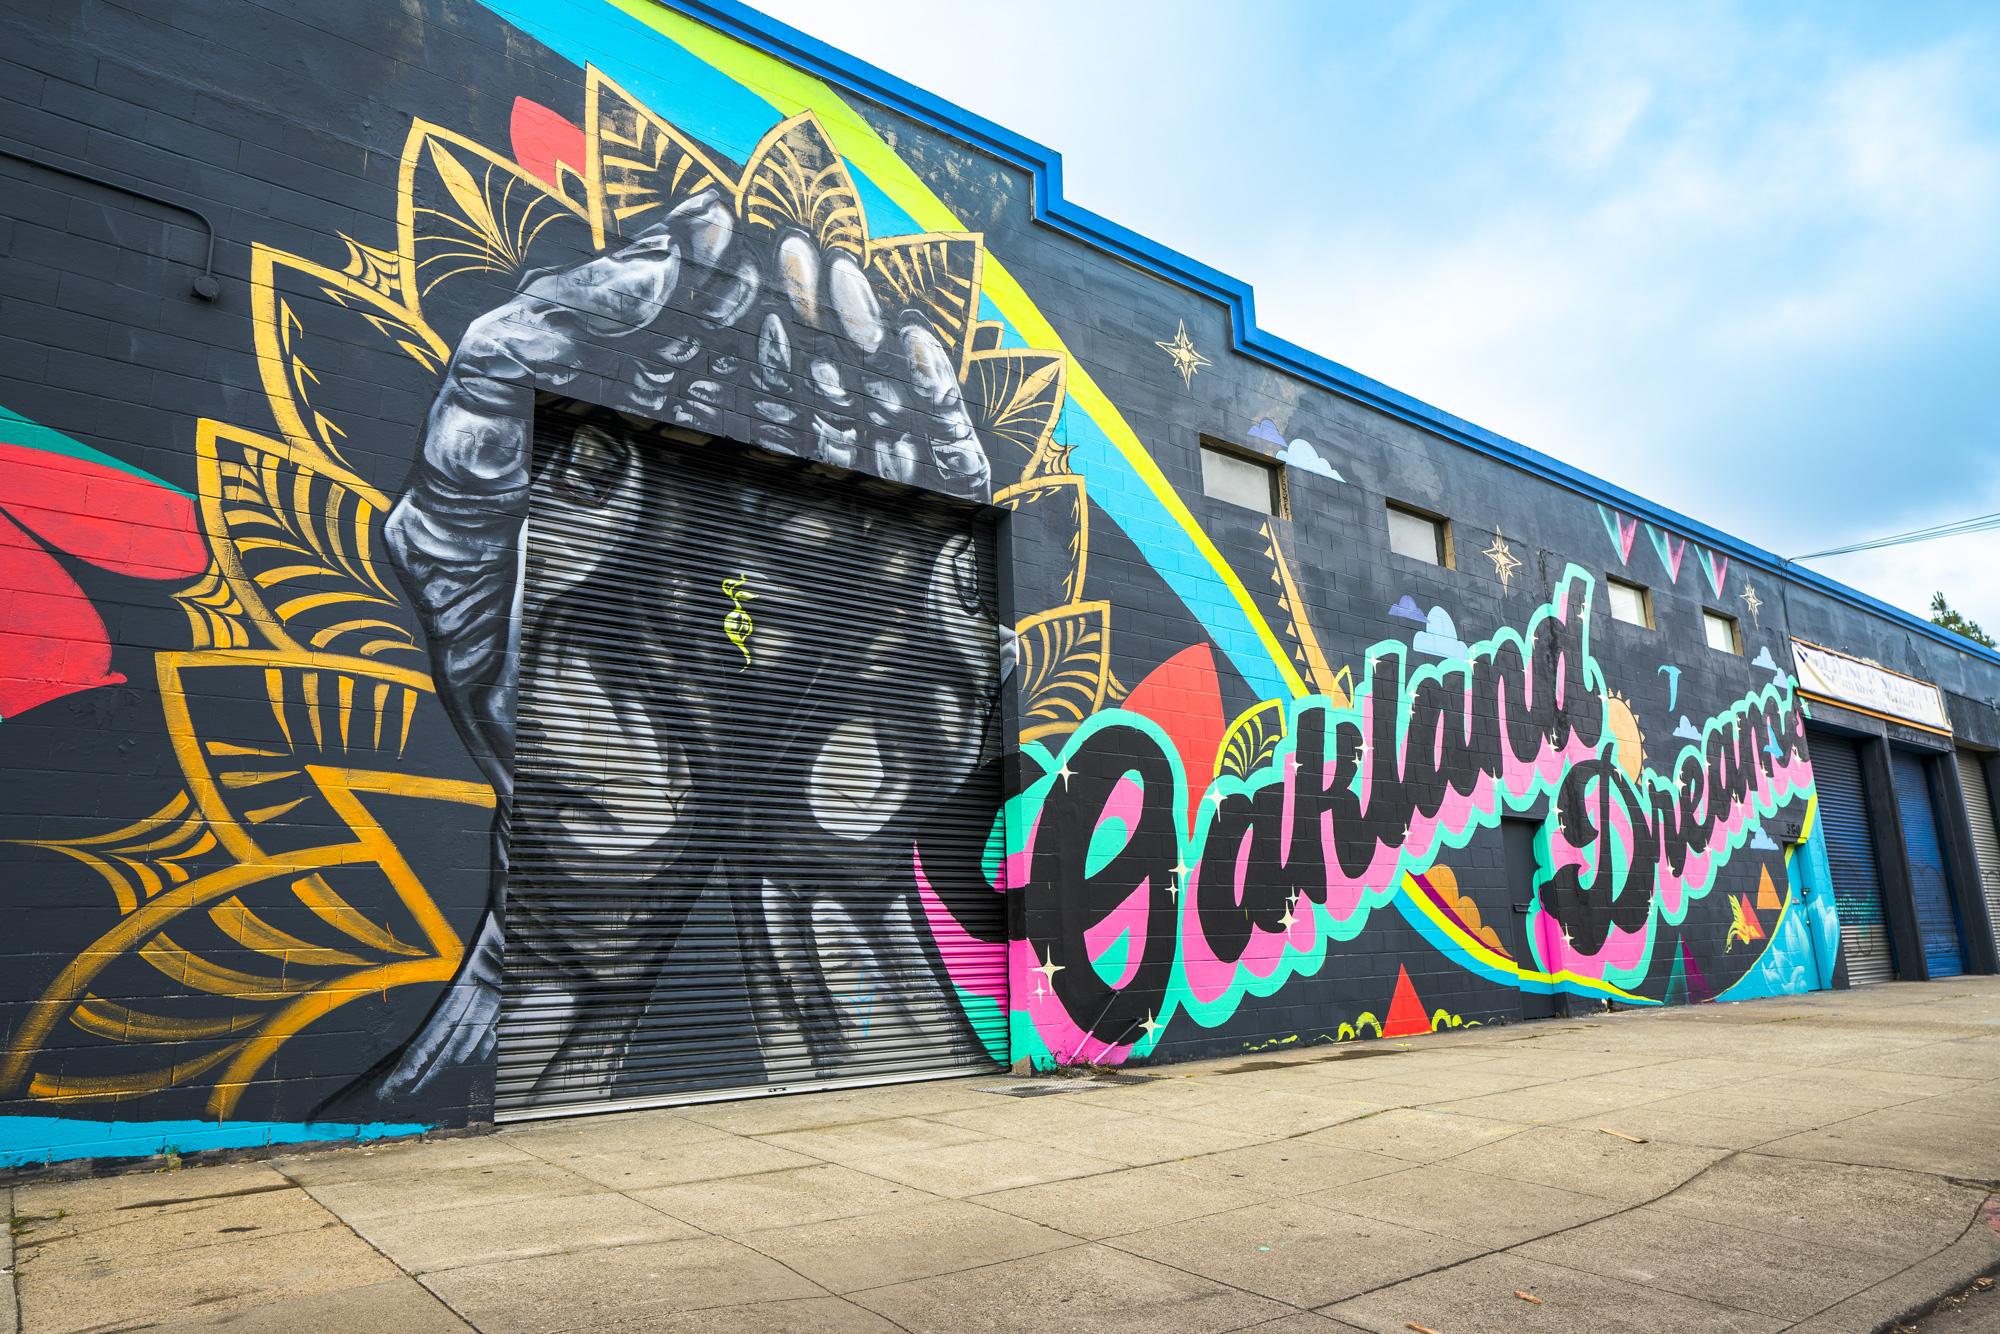 Where to Find Street Art Murals in Oakland, California